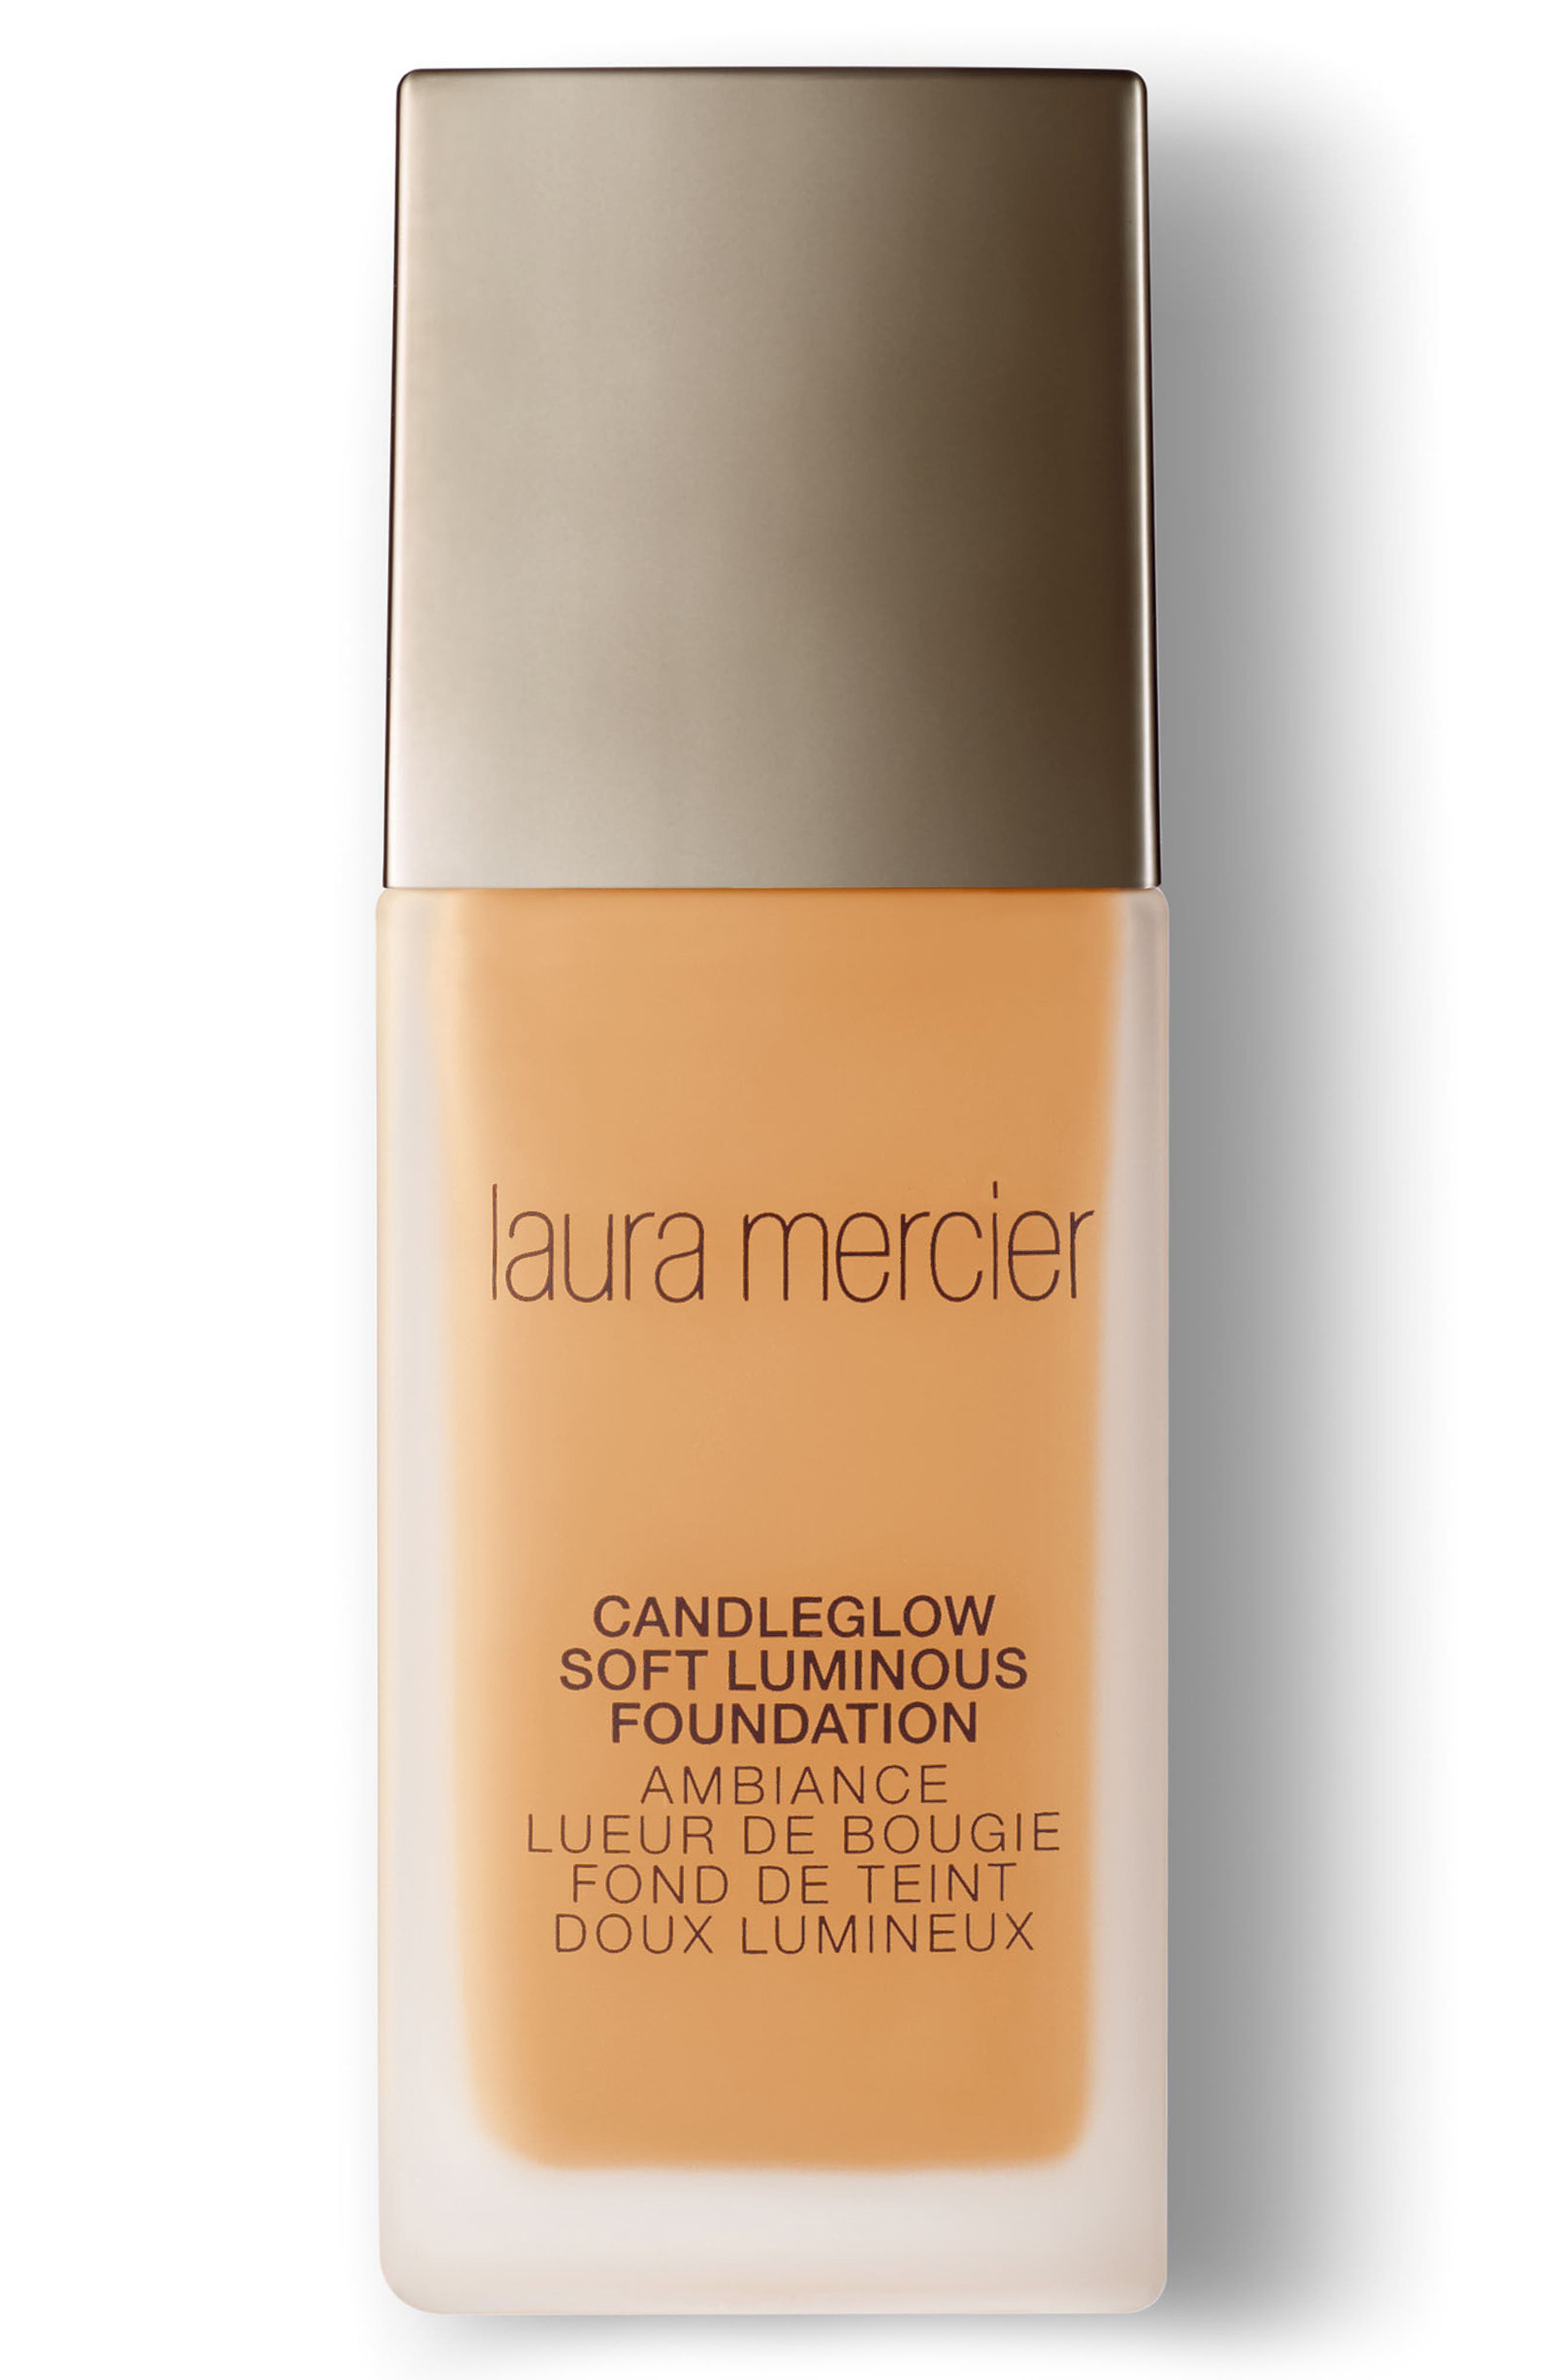 Candleglow Soft Luminous Foundation,                             Main thumbnail 1, color,                             2W2 Butterscotch